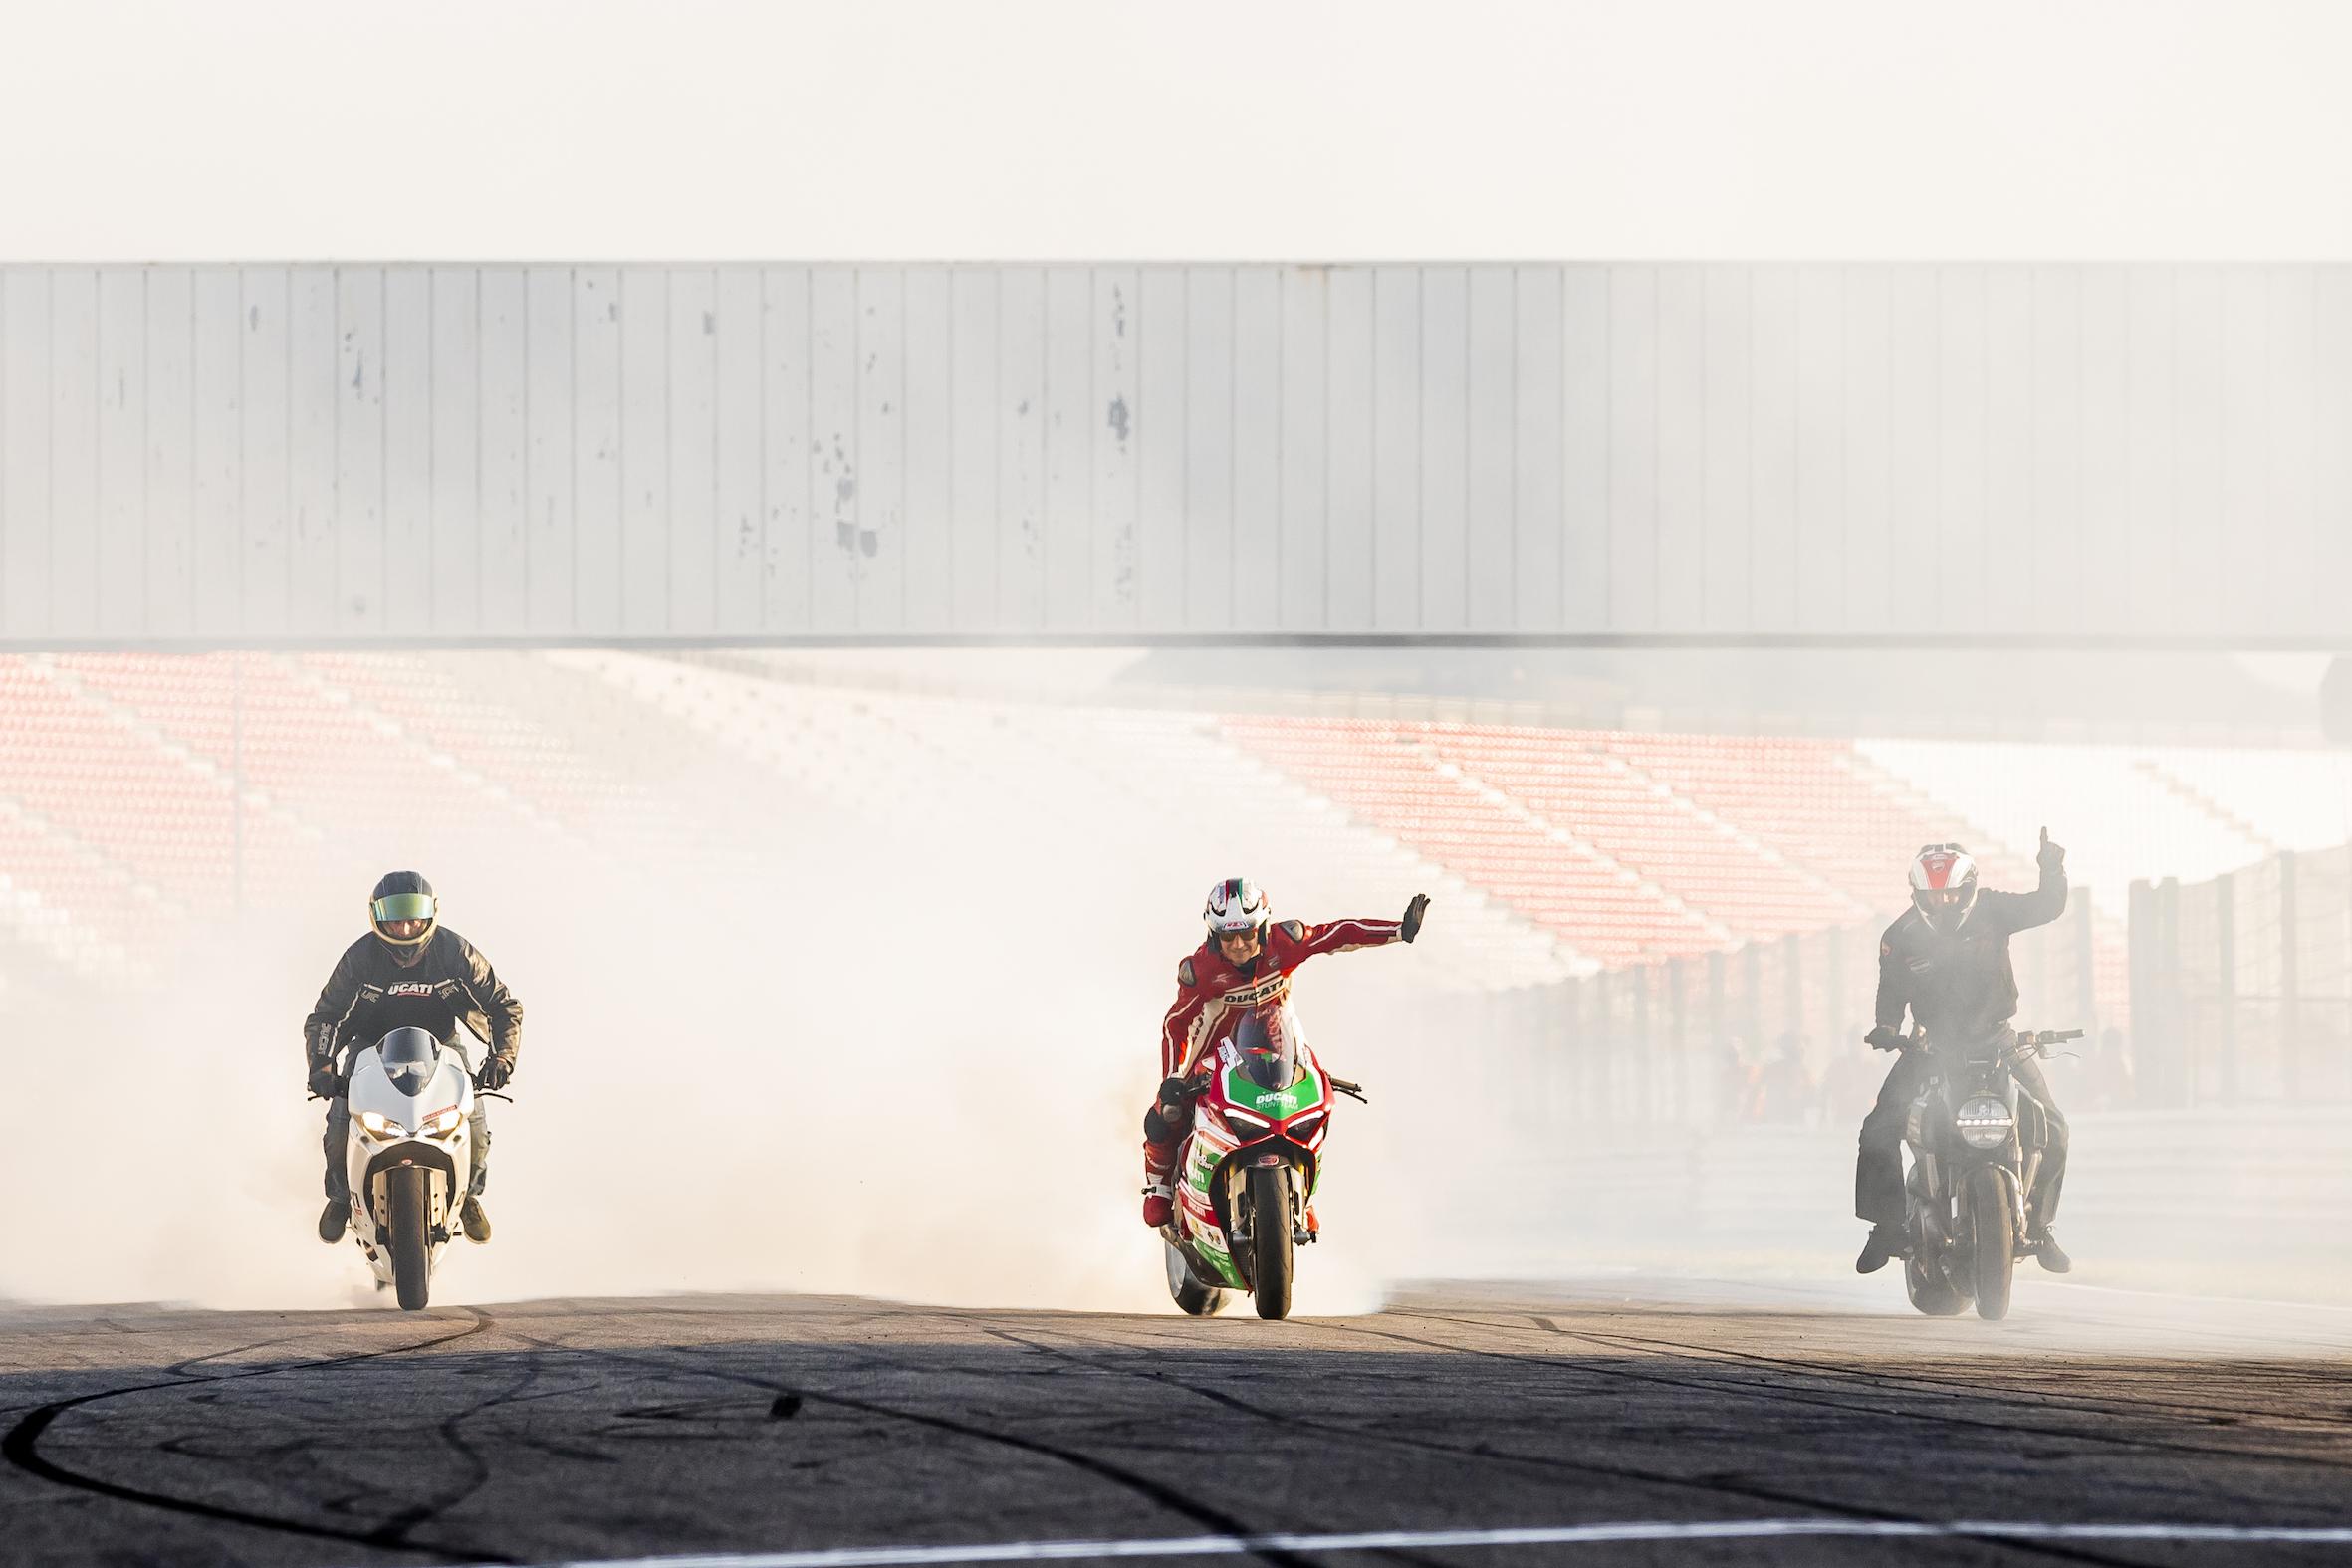 010_WORLD DUCATI WEEK_JUAN SANZ PHOTOGRAPHY_EMILIO_ZAMORA_STUNT_TEAM_MOTOR_SHOW_RIDER_MISANO_ITALIA_WDW 2018